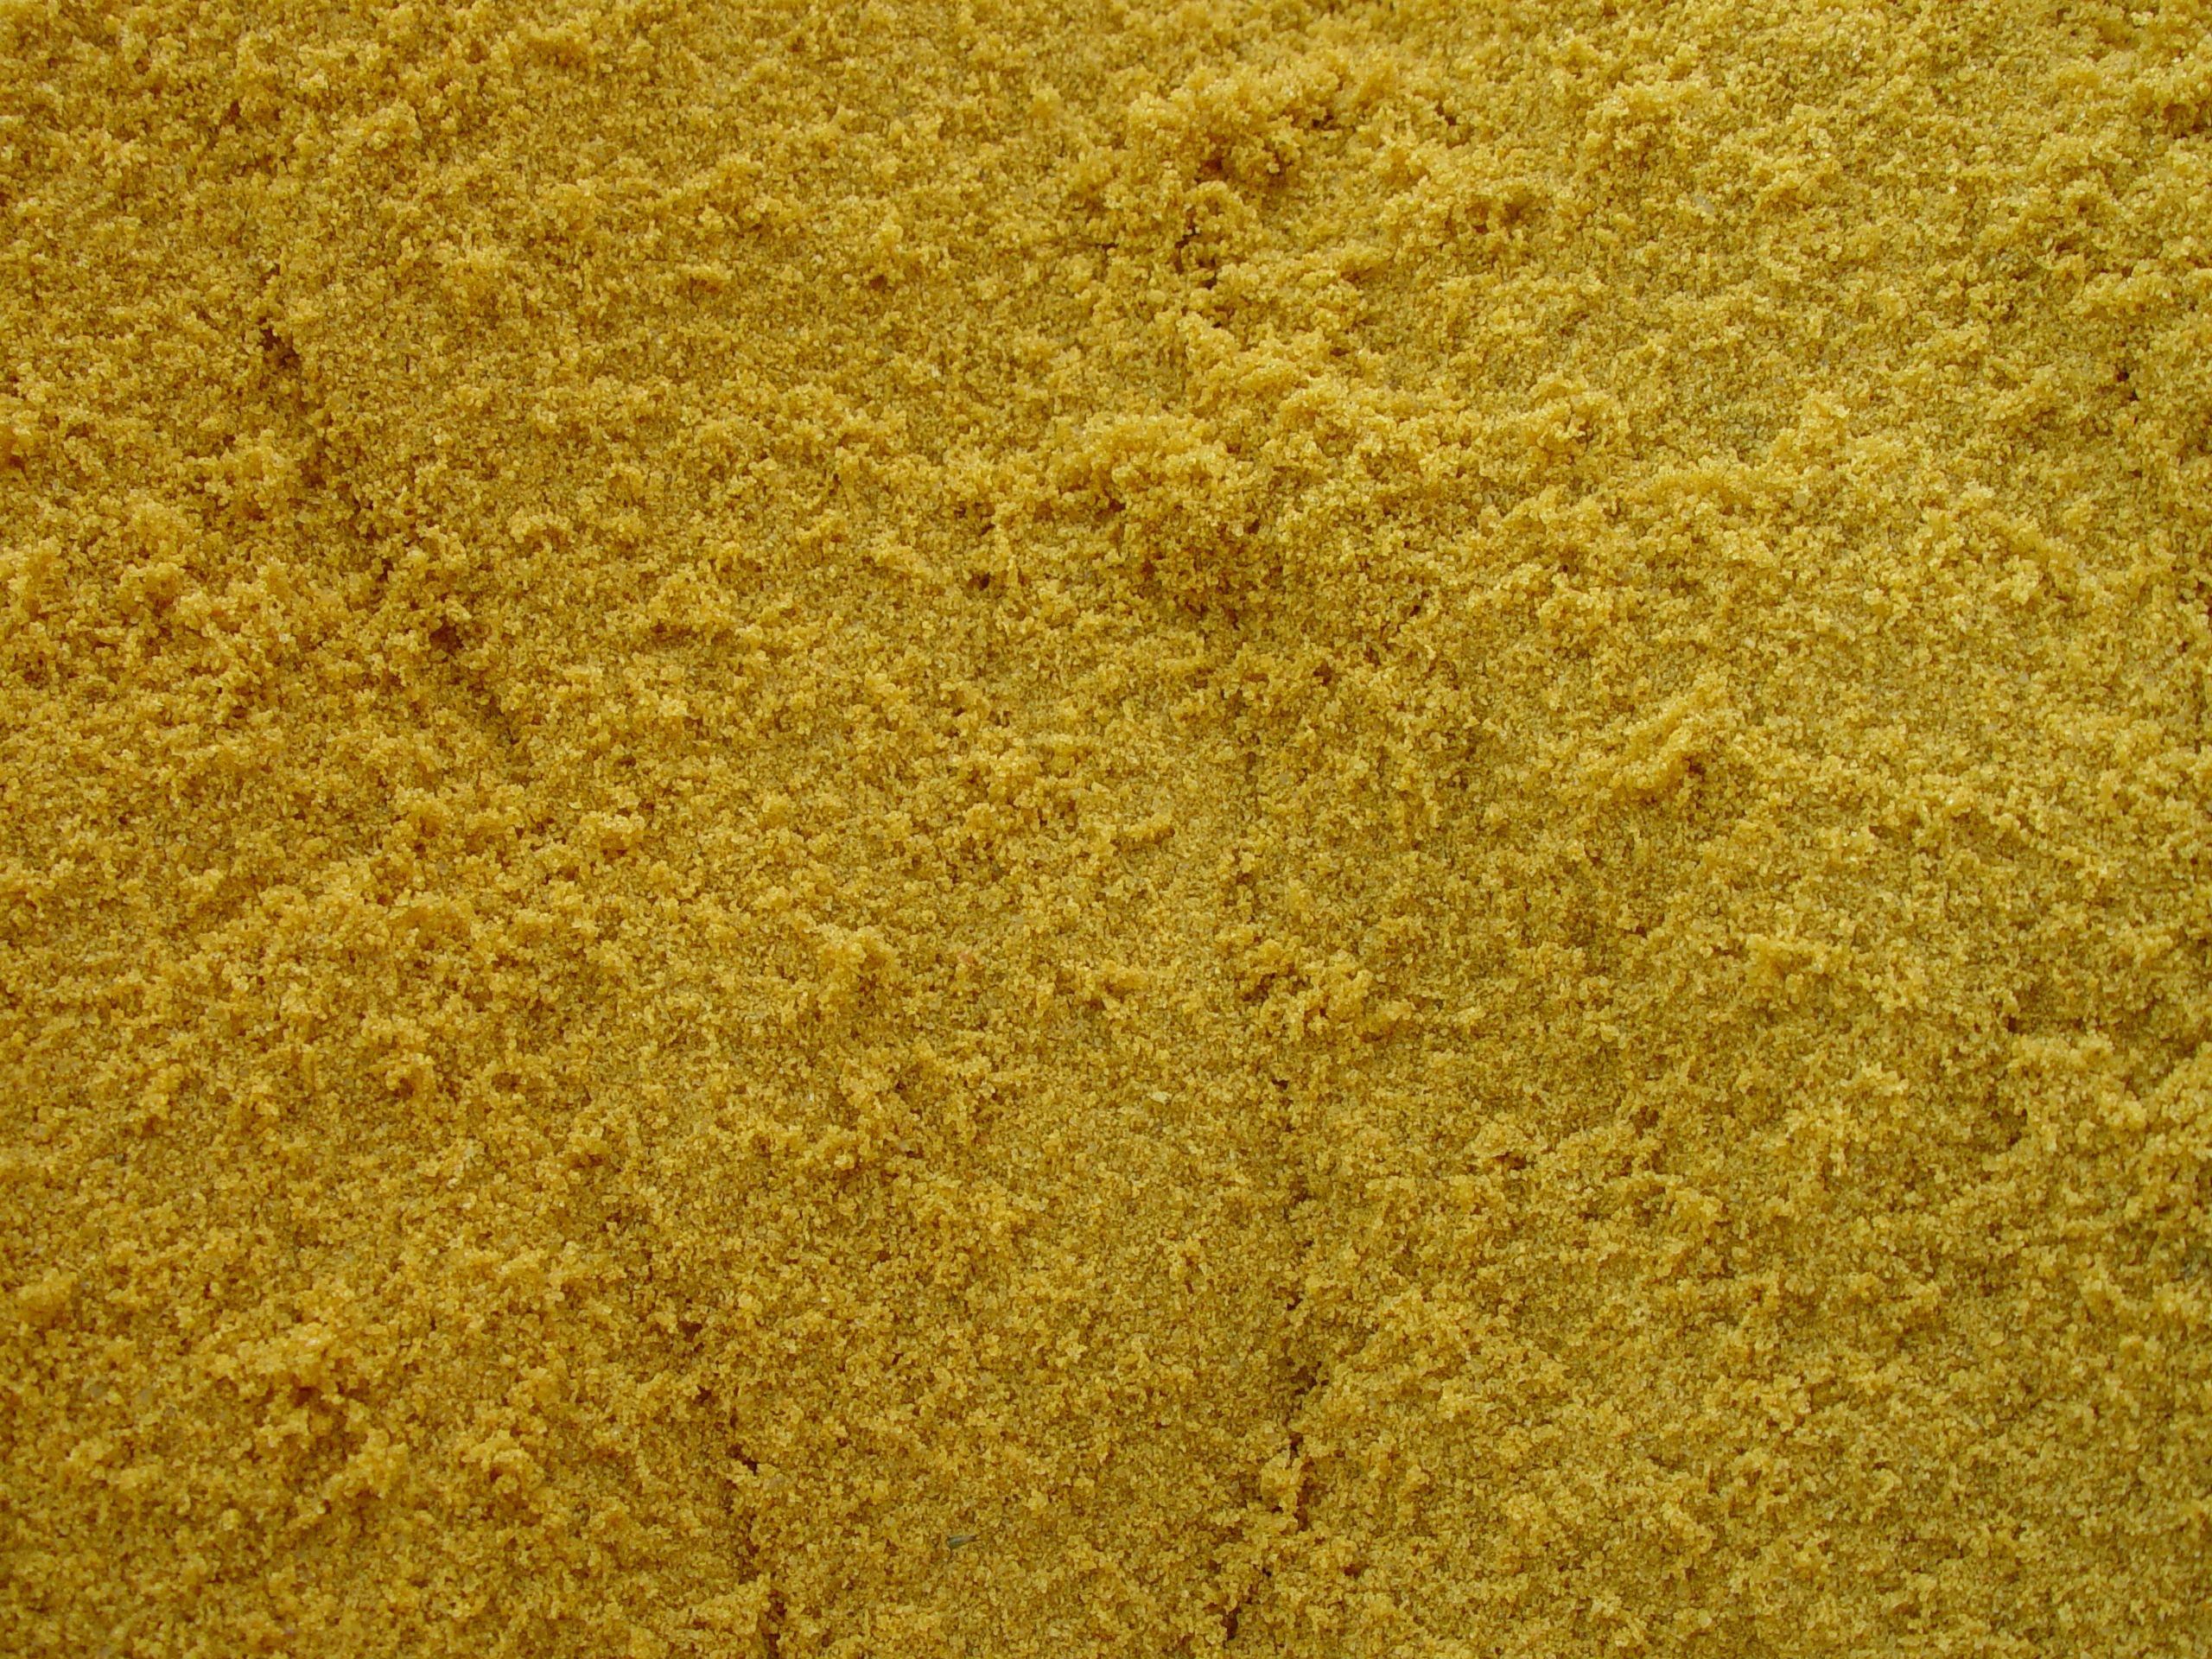 File:Yellow Sand Texture.jpg